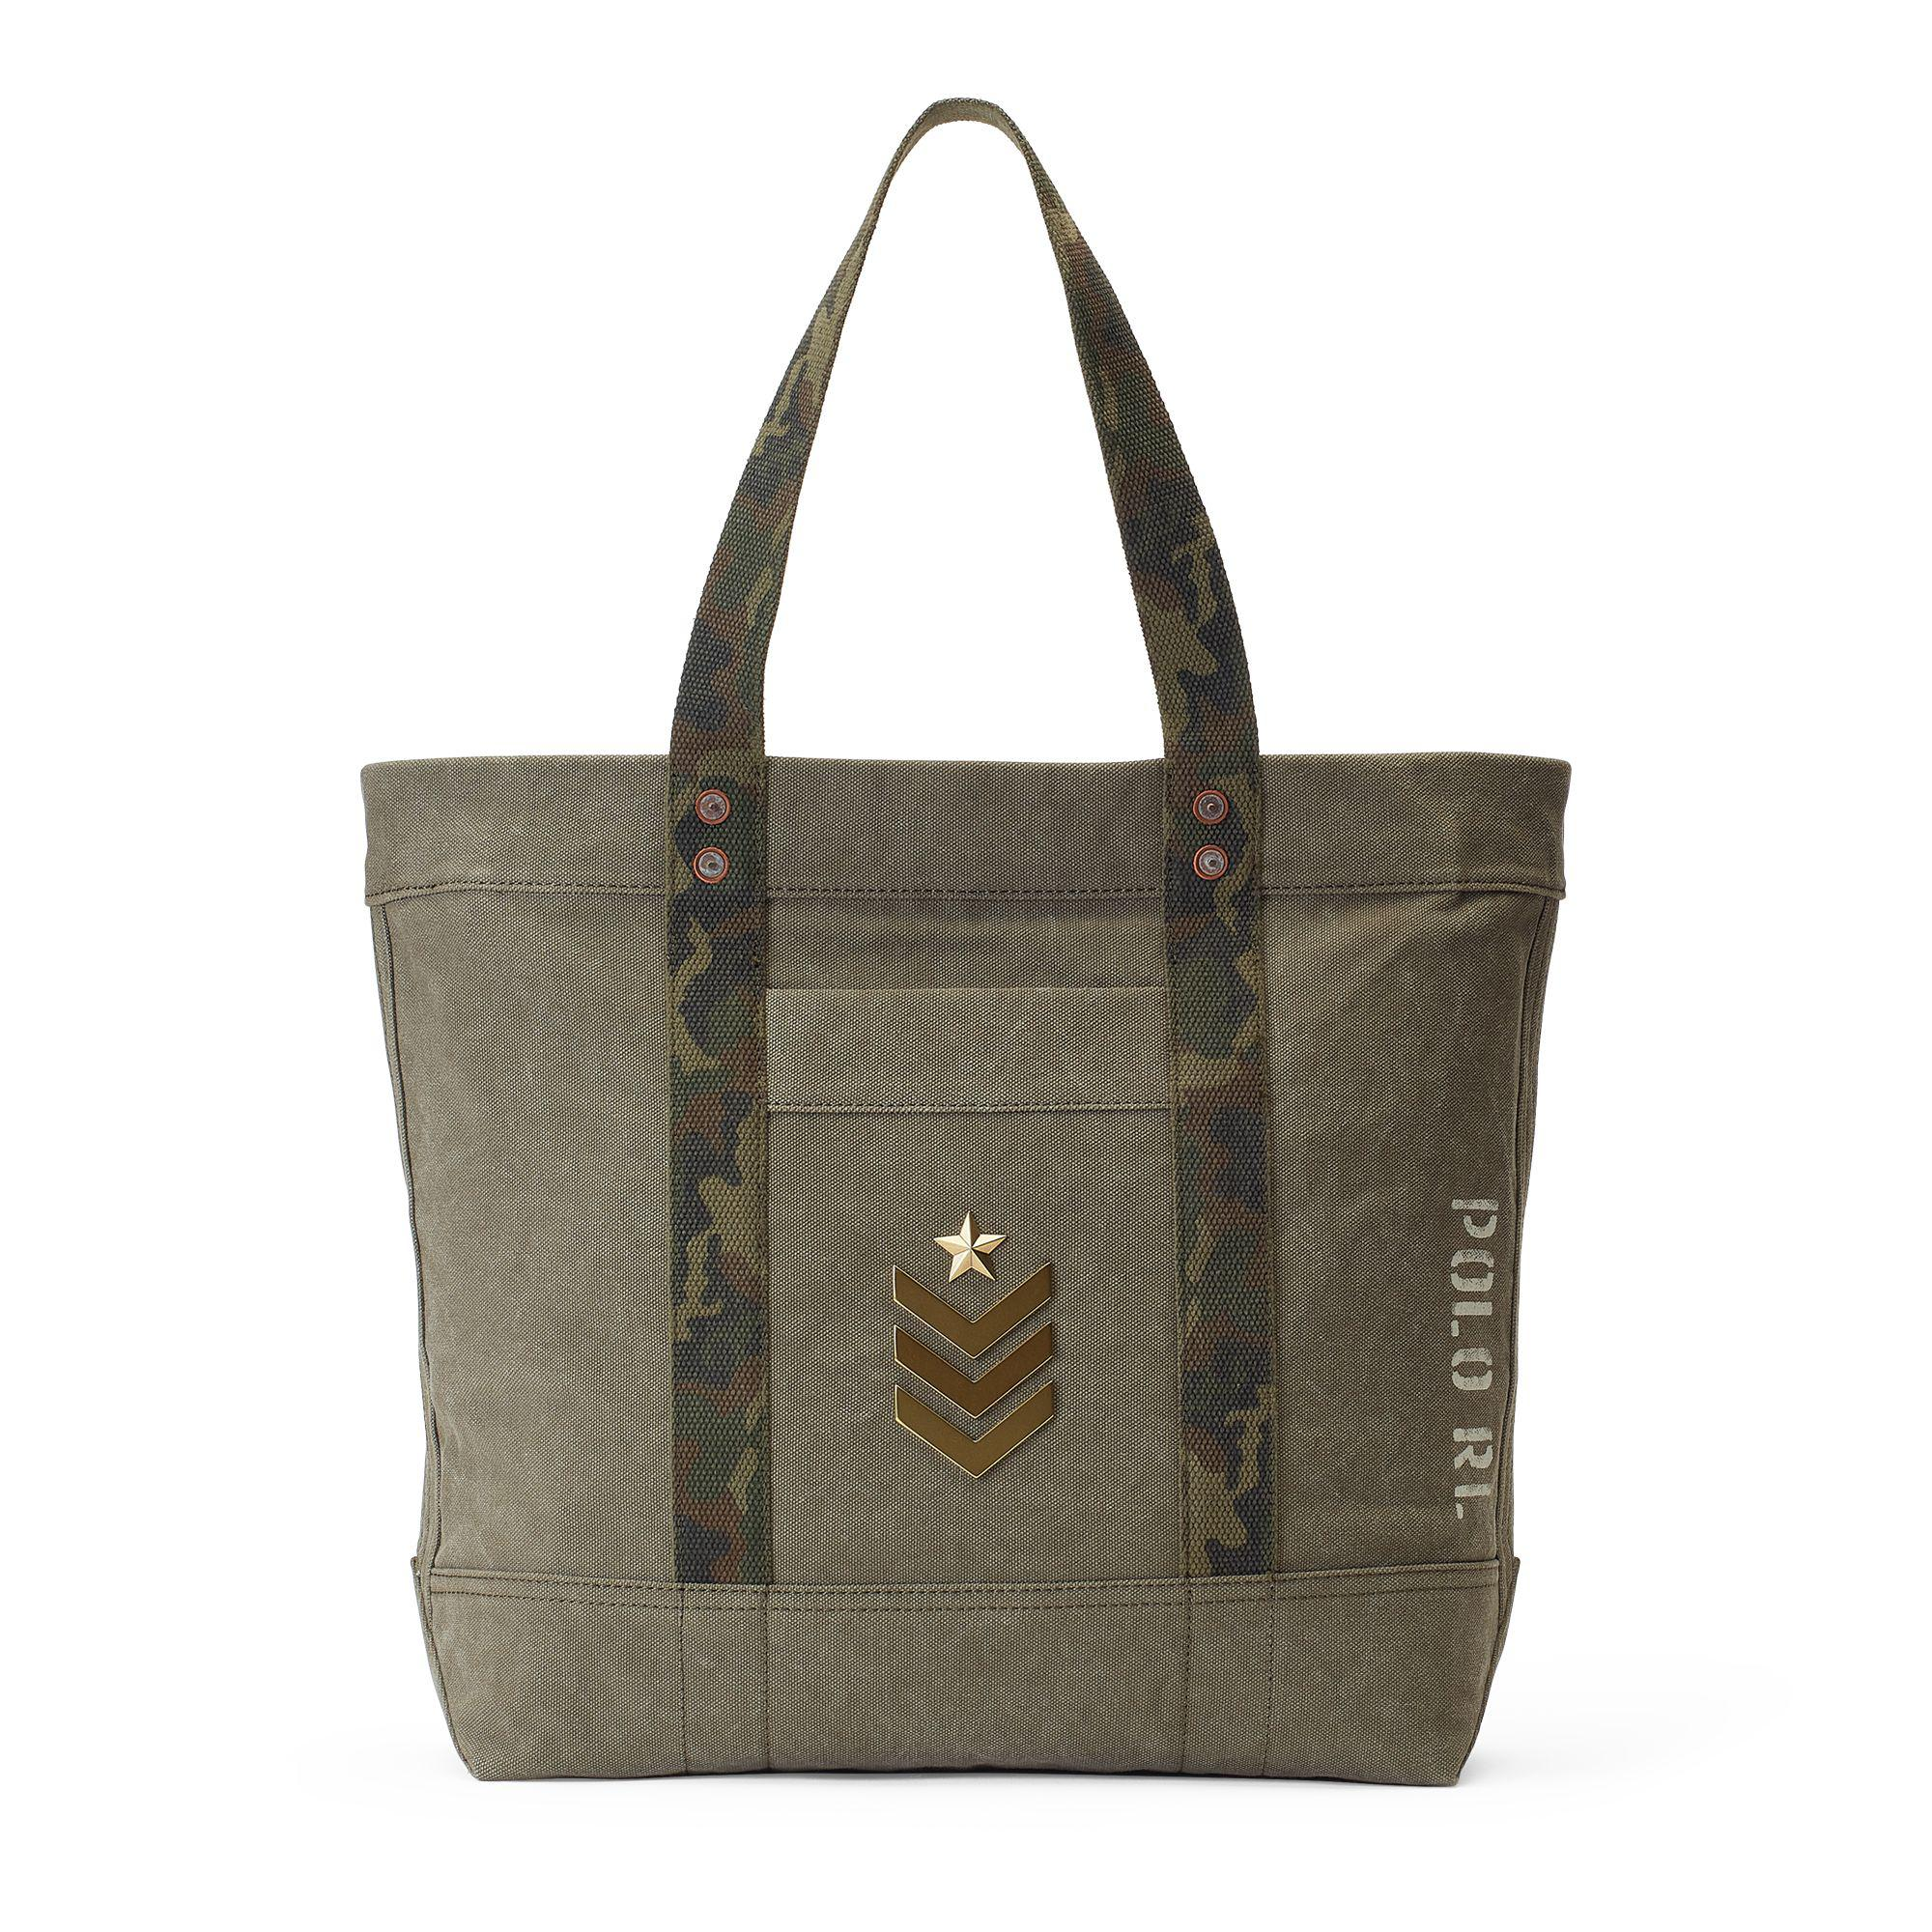 de1079e2400 Polo Ralph Lauren Military Canvas Tote Bag in Green - Lyst